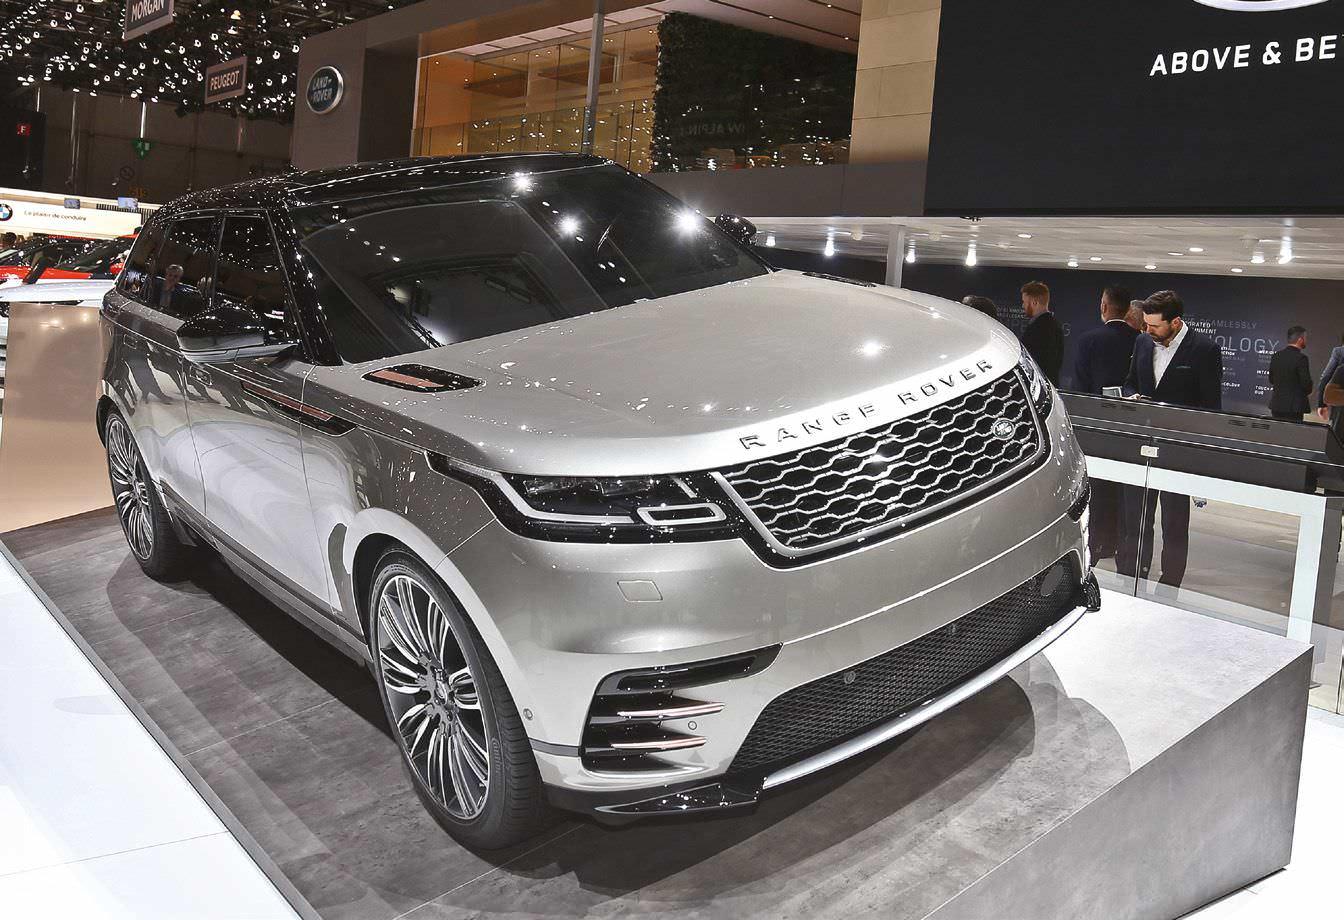 On-Road Dynamism With Range Rover Velar